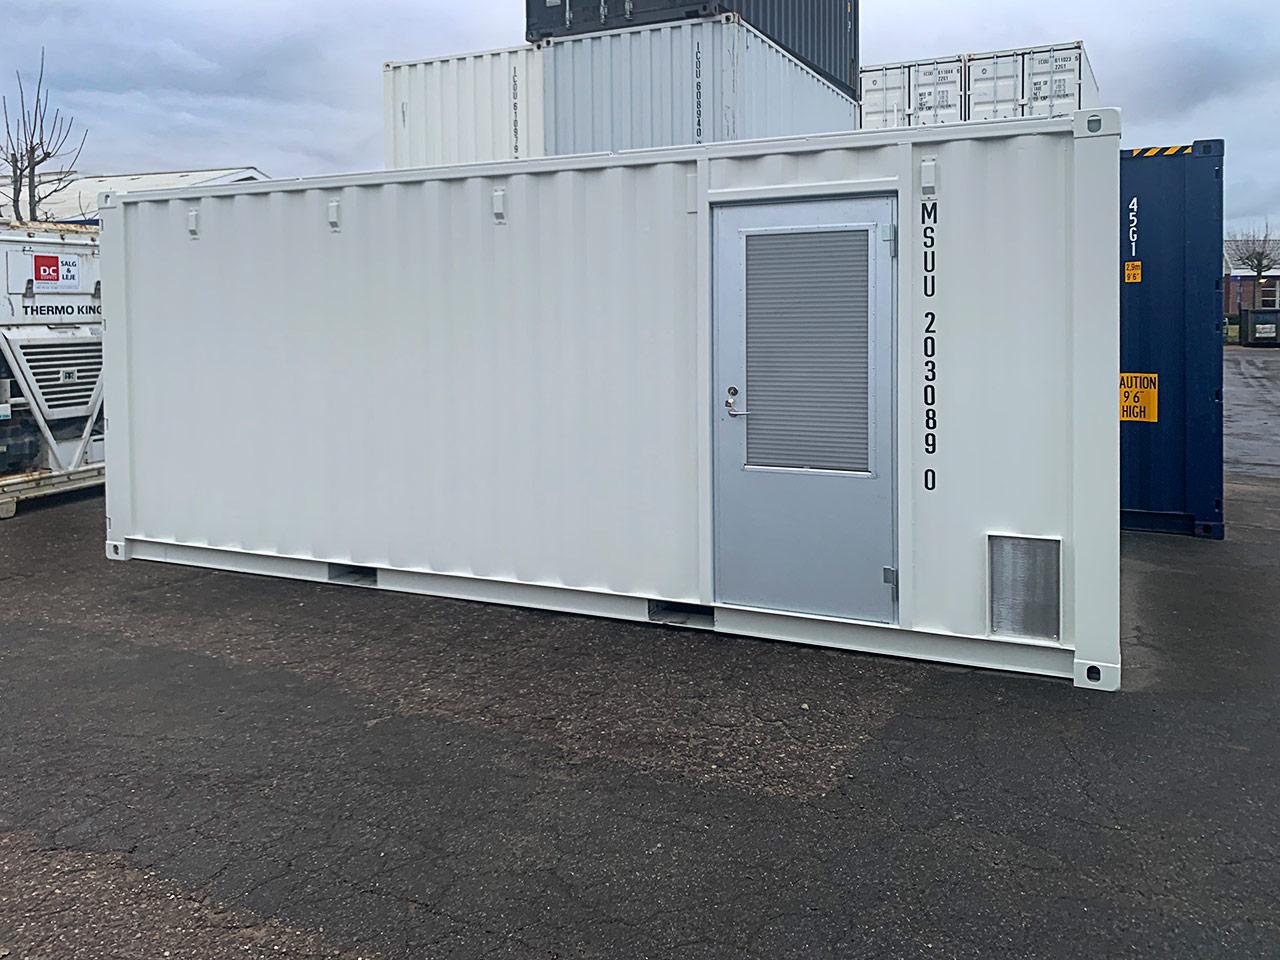 Specialbygget støjdæmpet container